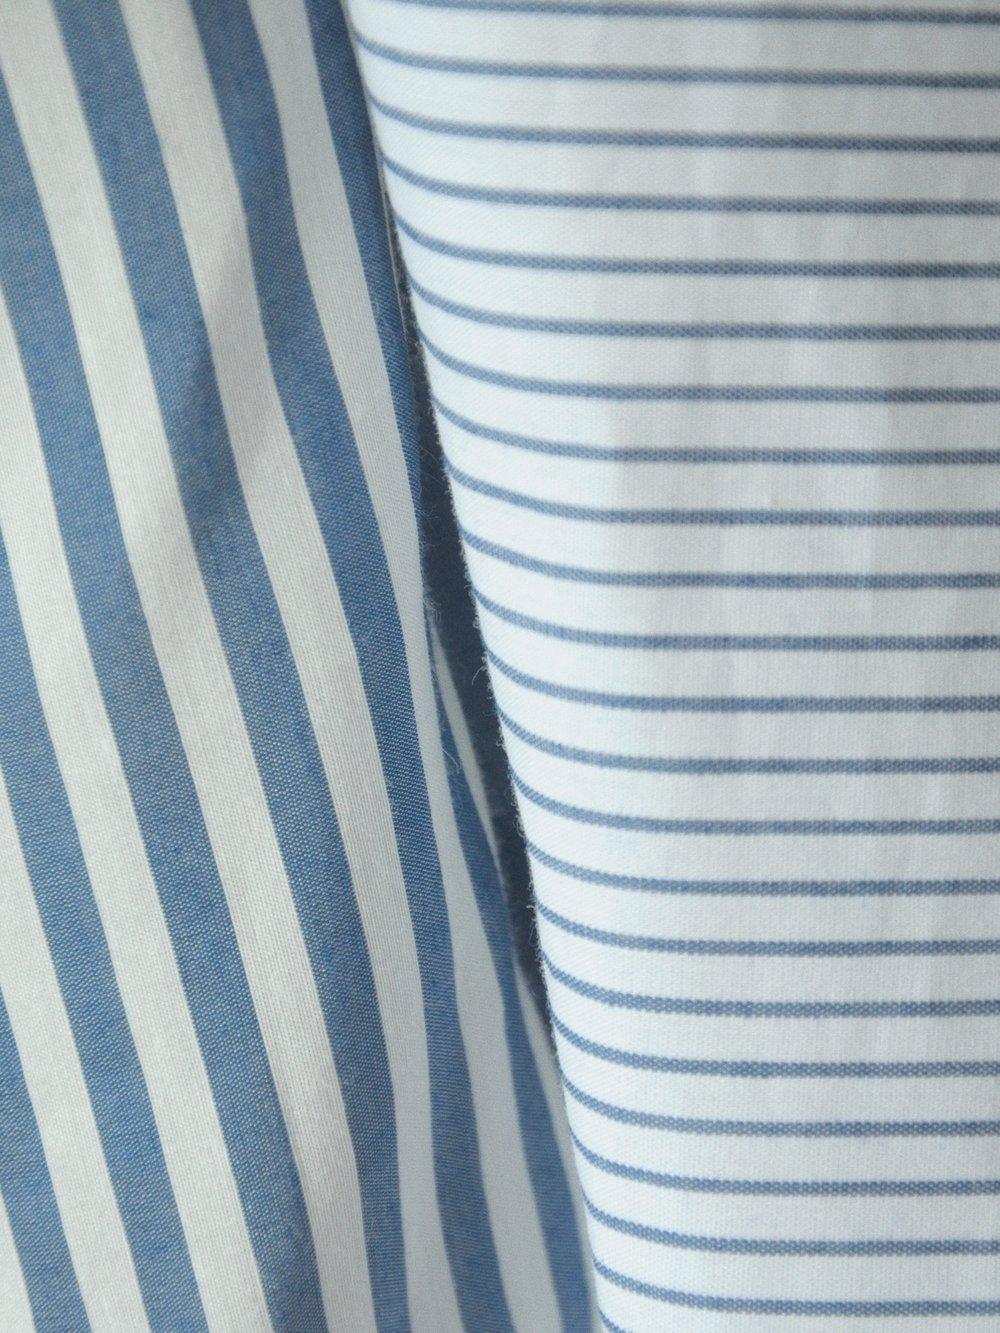 Camisa Arnela - Edición Limitada